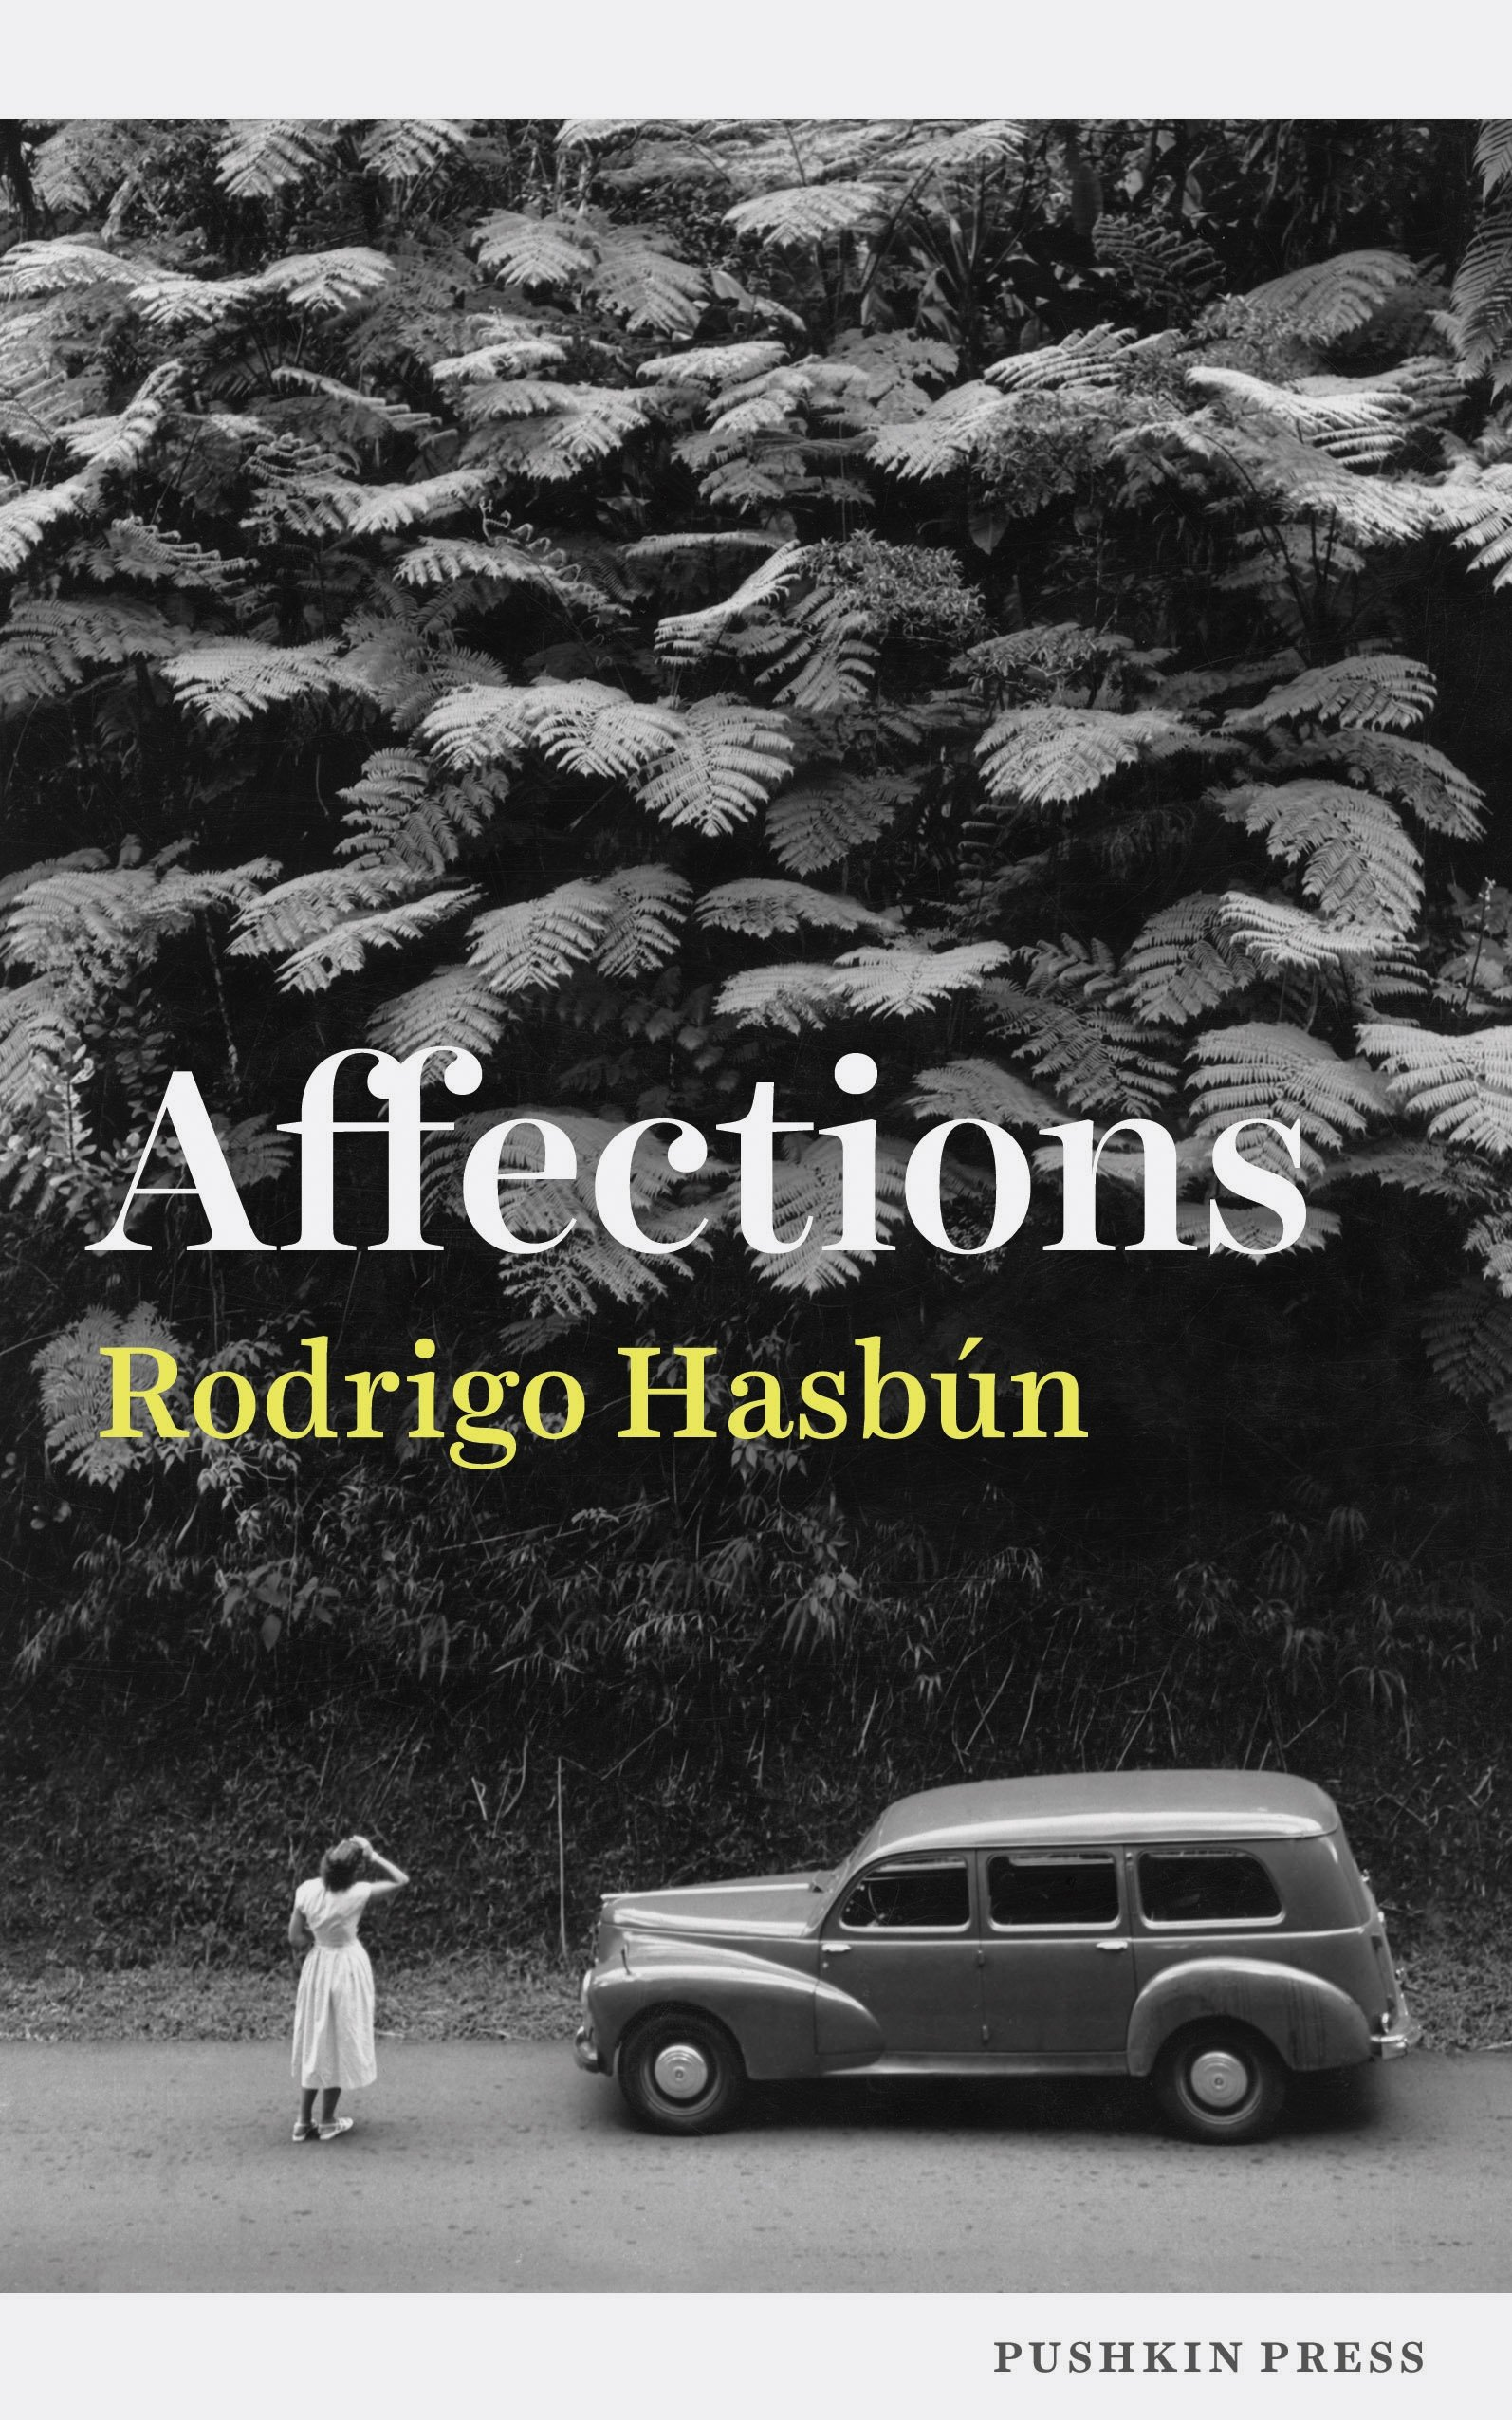 Affections: Amazon.es: Hasbun, Rodrigo: Libros en idiomas extranjeros